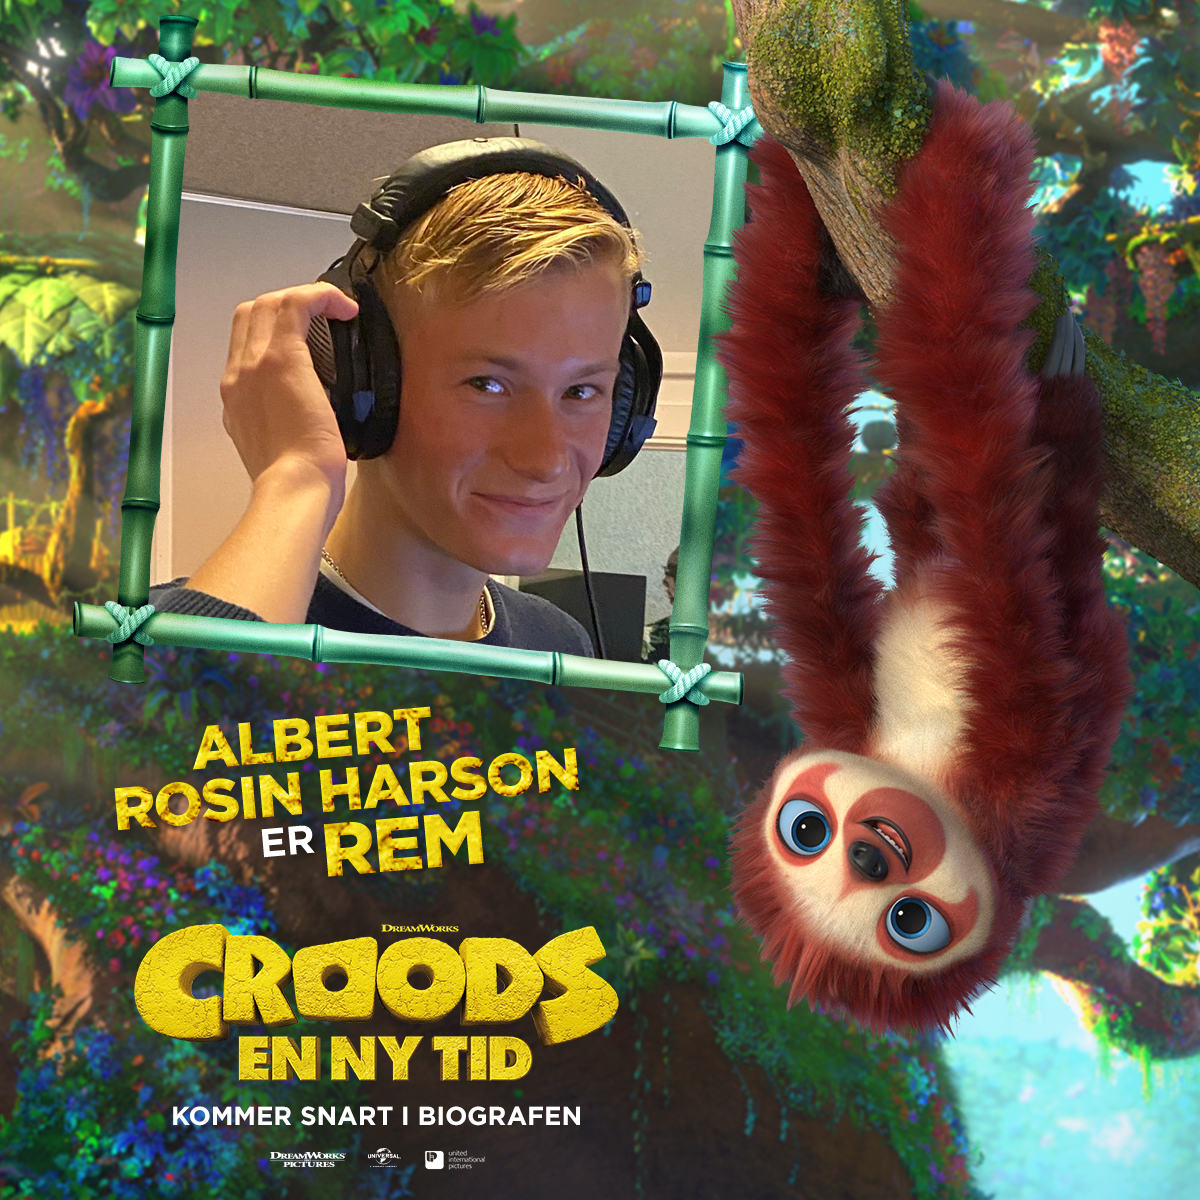 Croods - Karakterkort - Rem (Albert Rosin Harson) 3